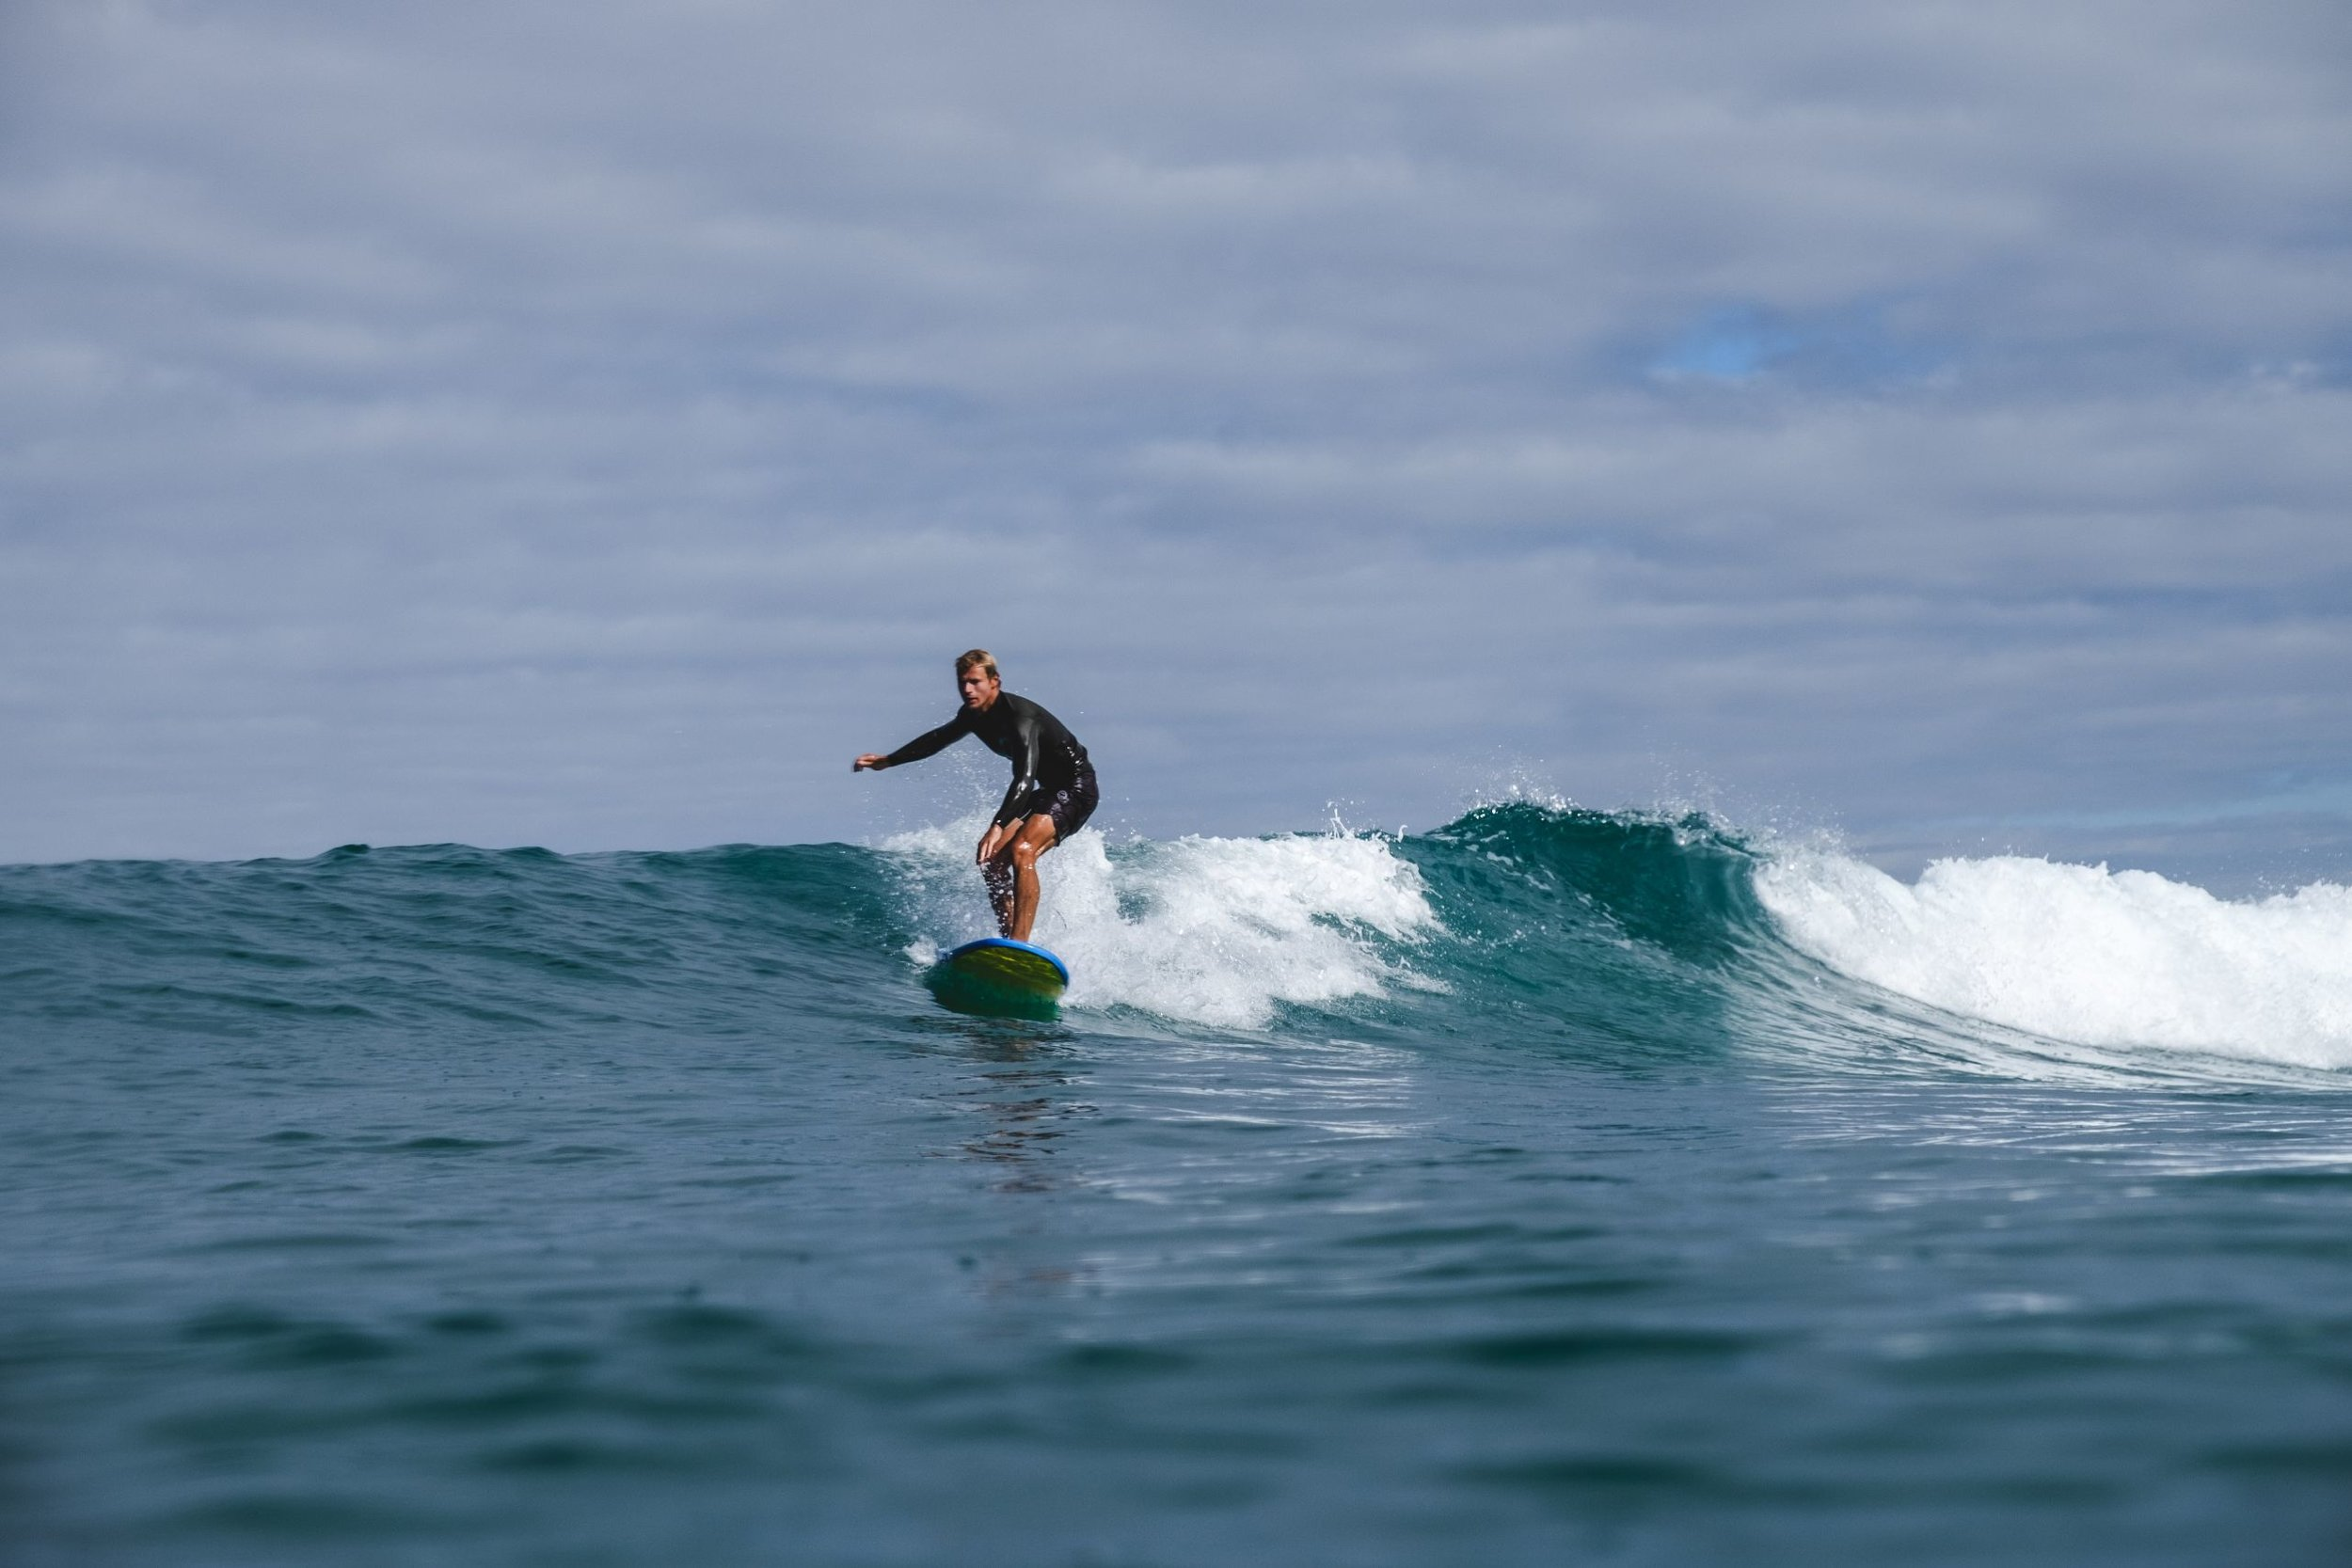 surf-guiding-hossegor.jpg